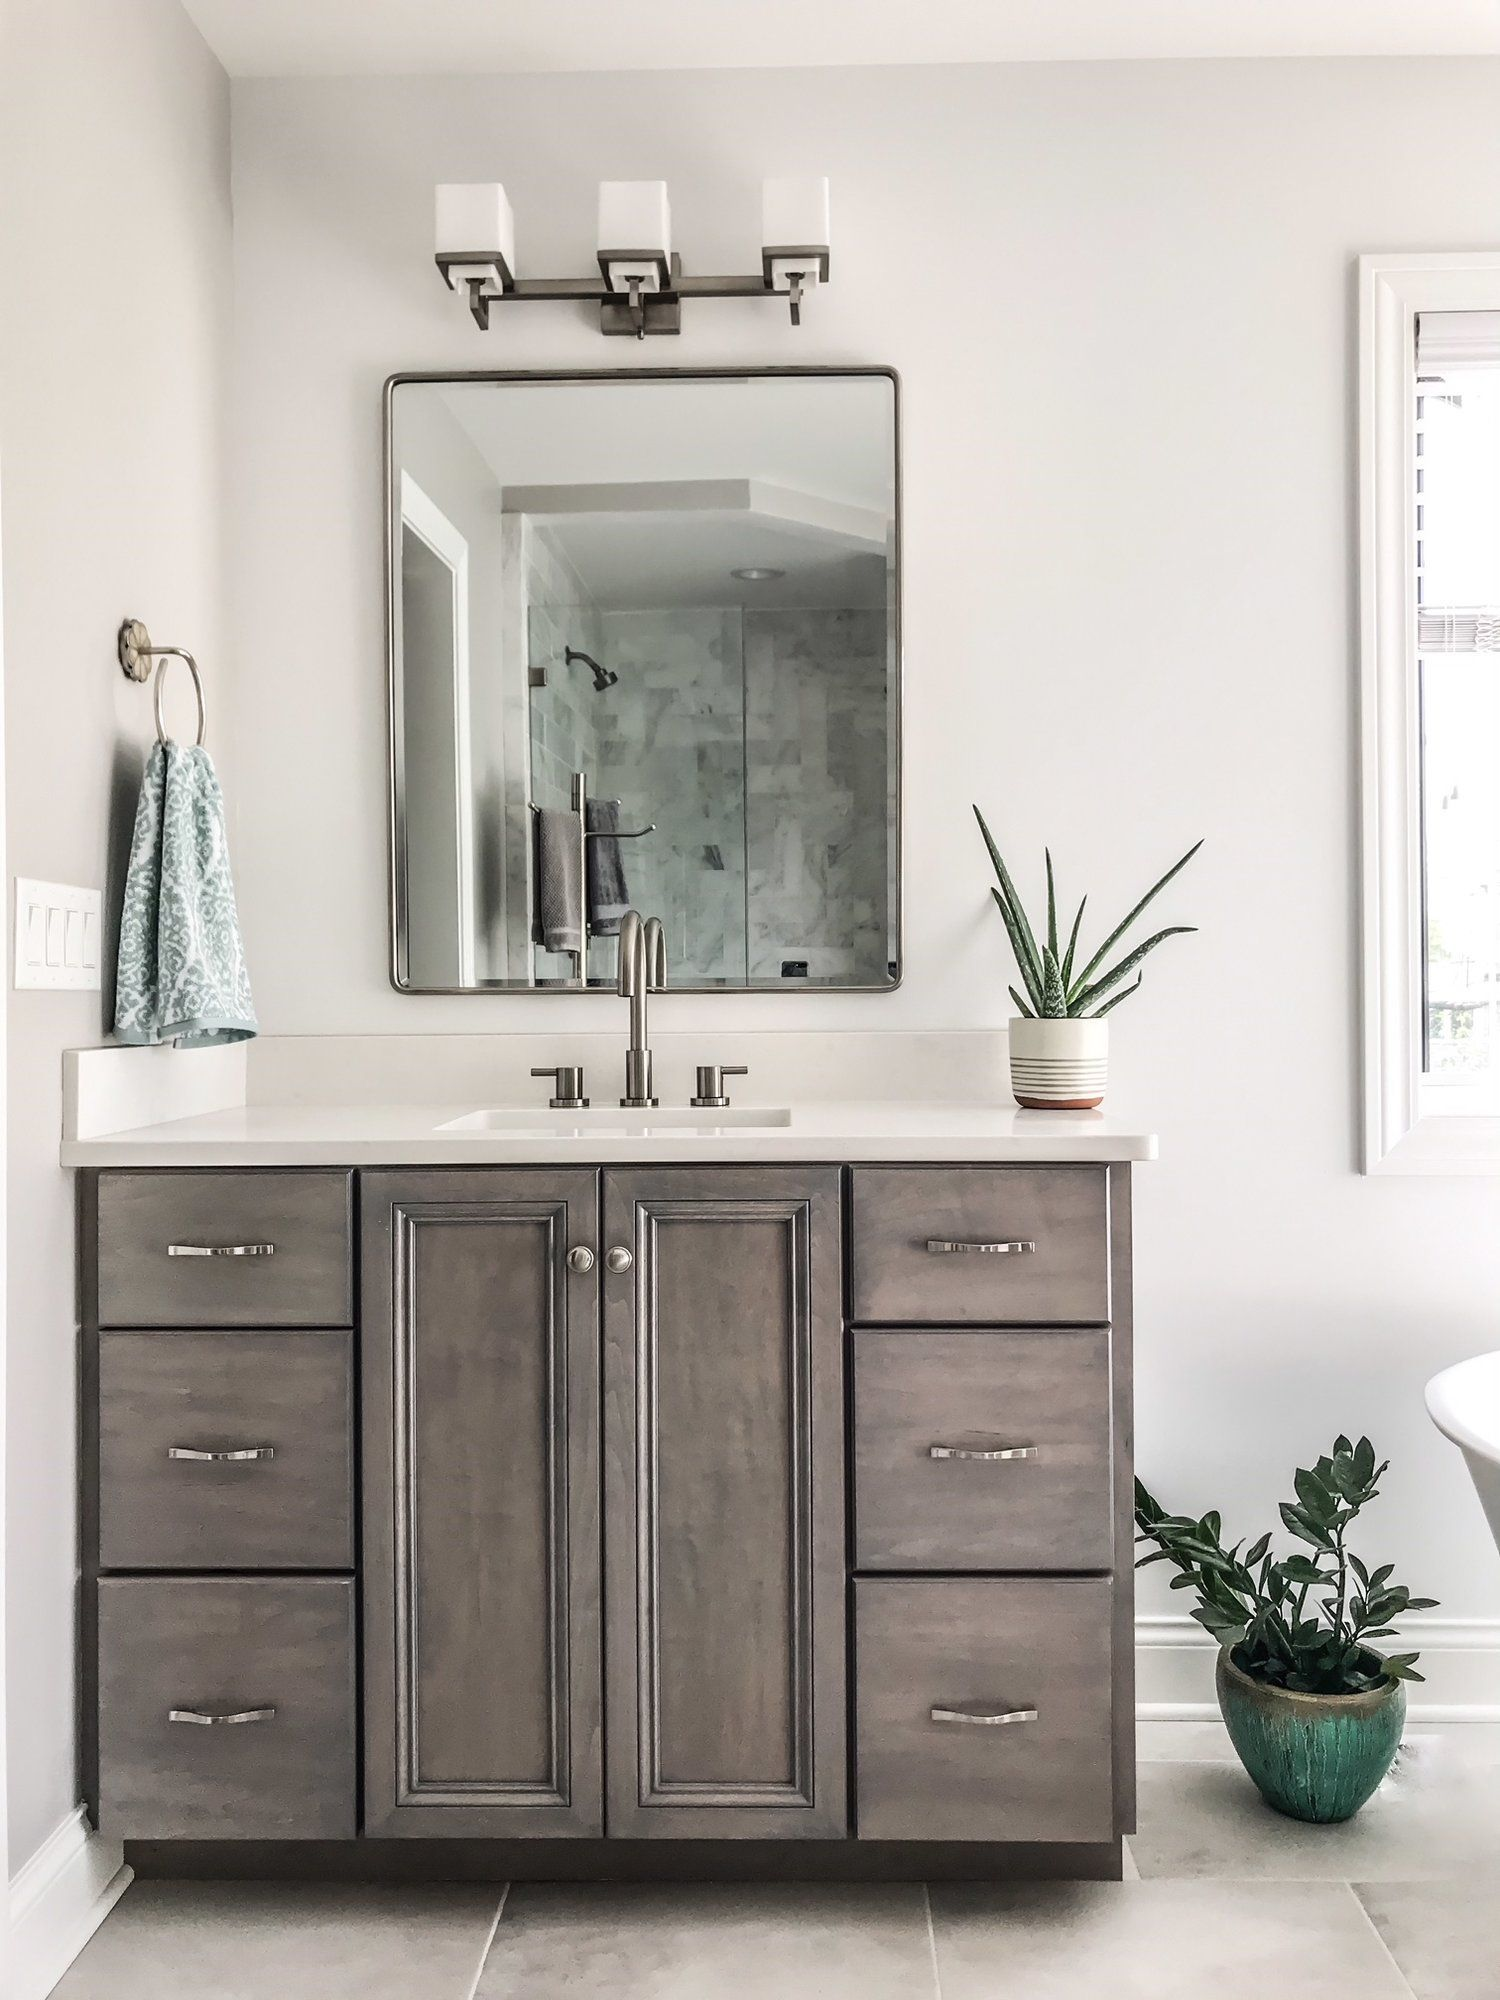 Grey Bathroom Vanity Gray Bathroom Decor Rectangle Rustic Bathroom Mirrors Modern Master B Gray Bathroom Decor Grey Bathroom Vanity Rustic Bathroom Vanities